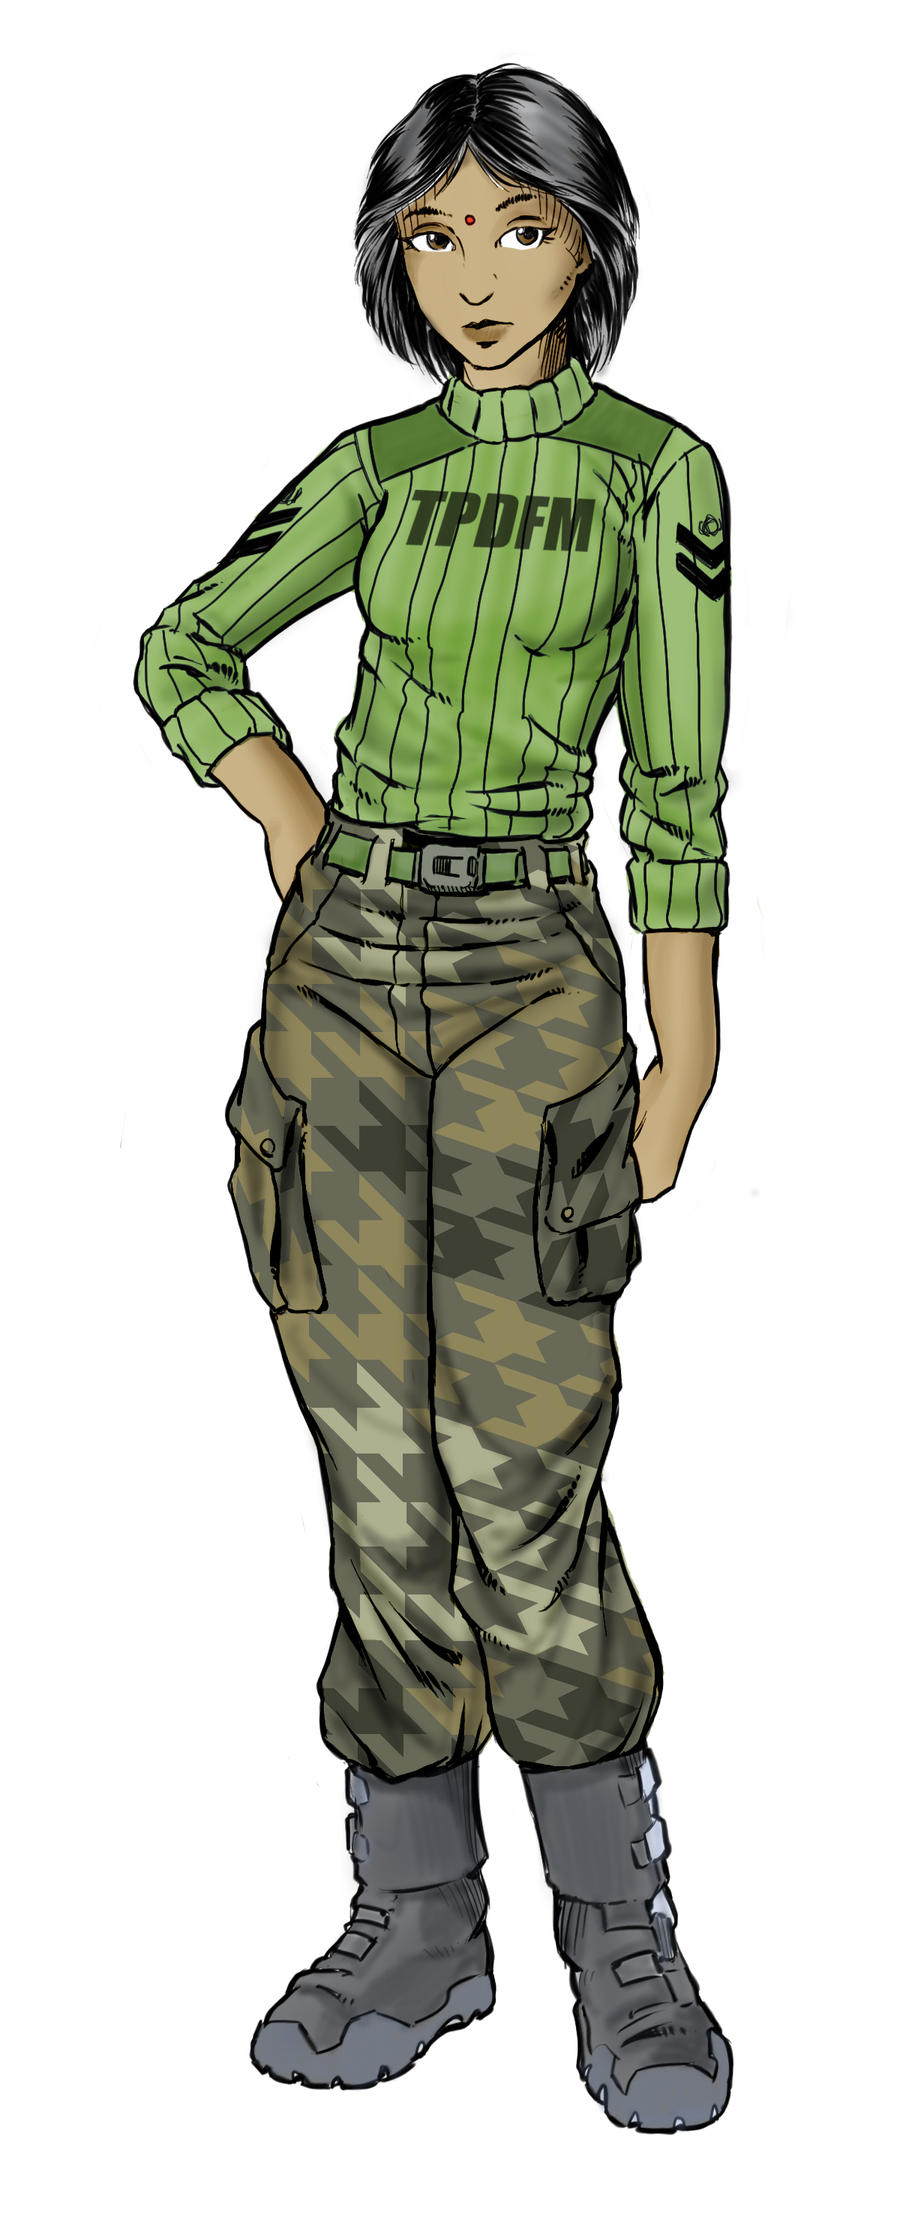 Terran Praesidium Marines Fatigue / Duty uniform by Sabakakrazny